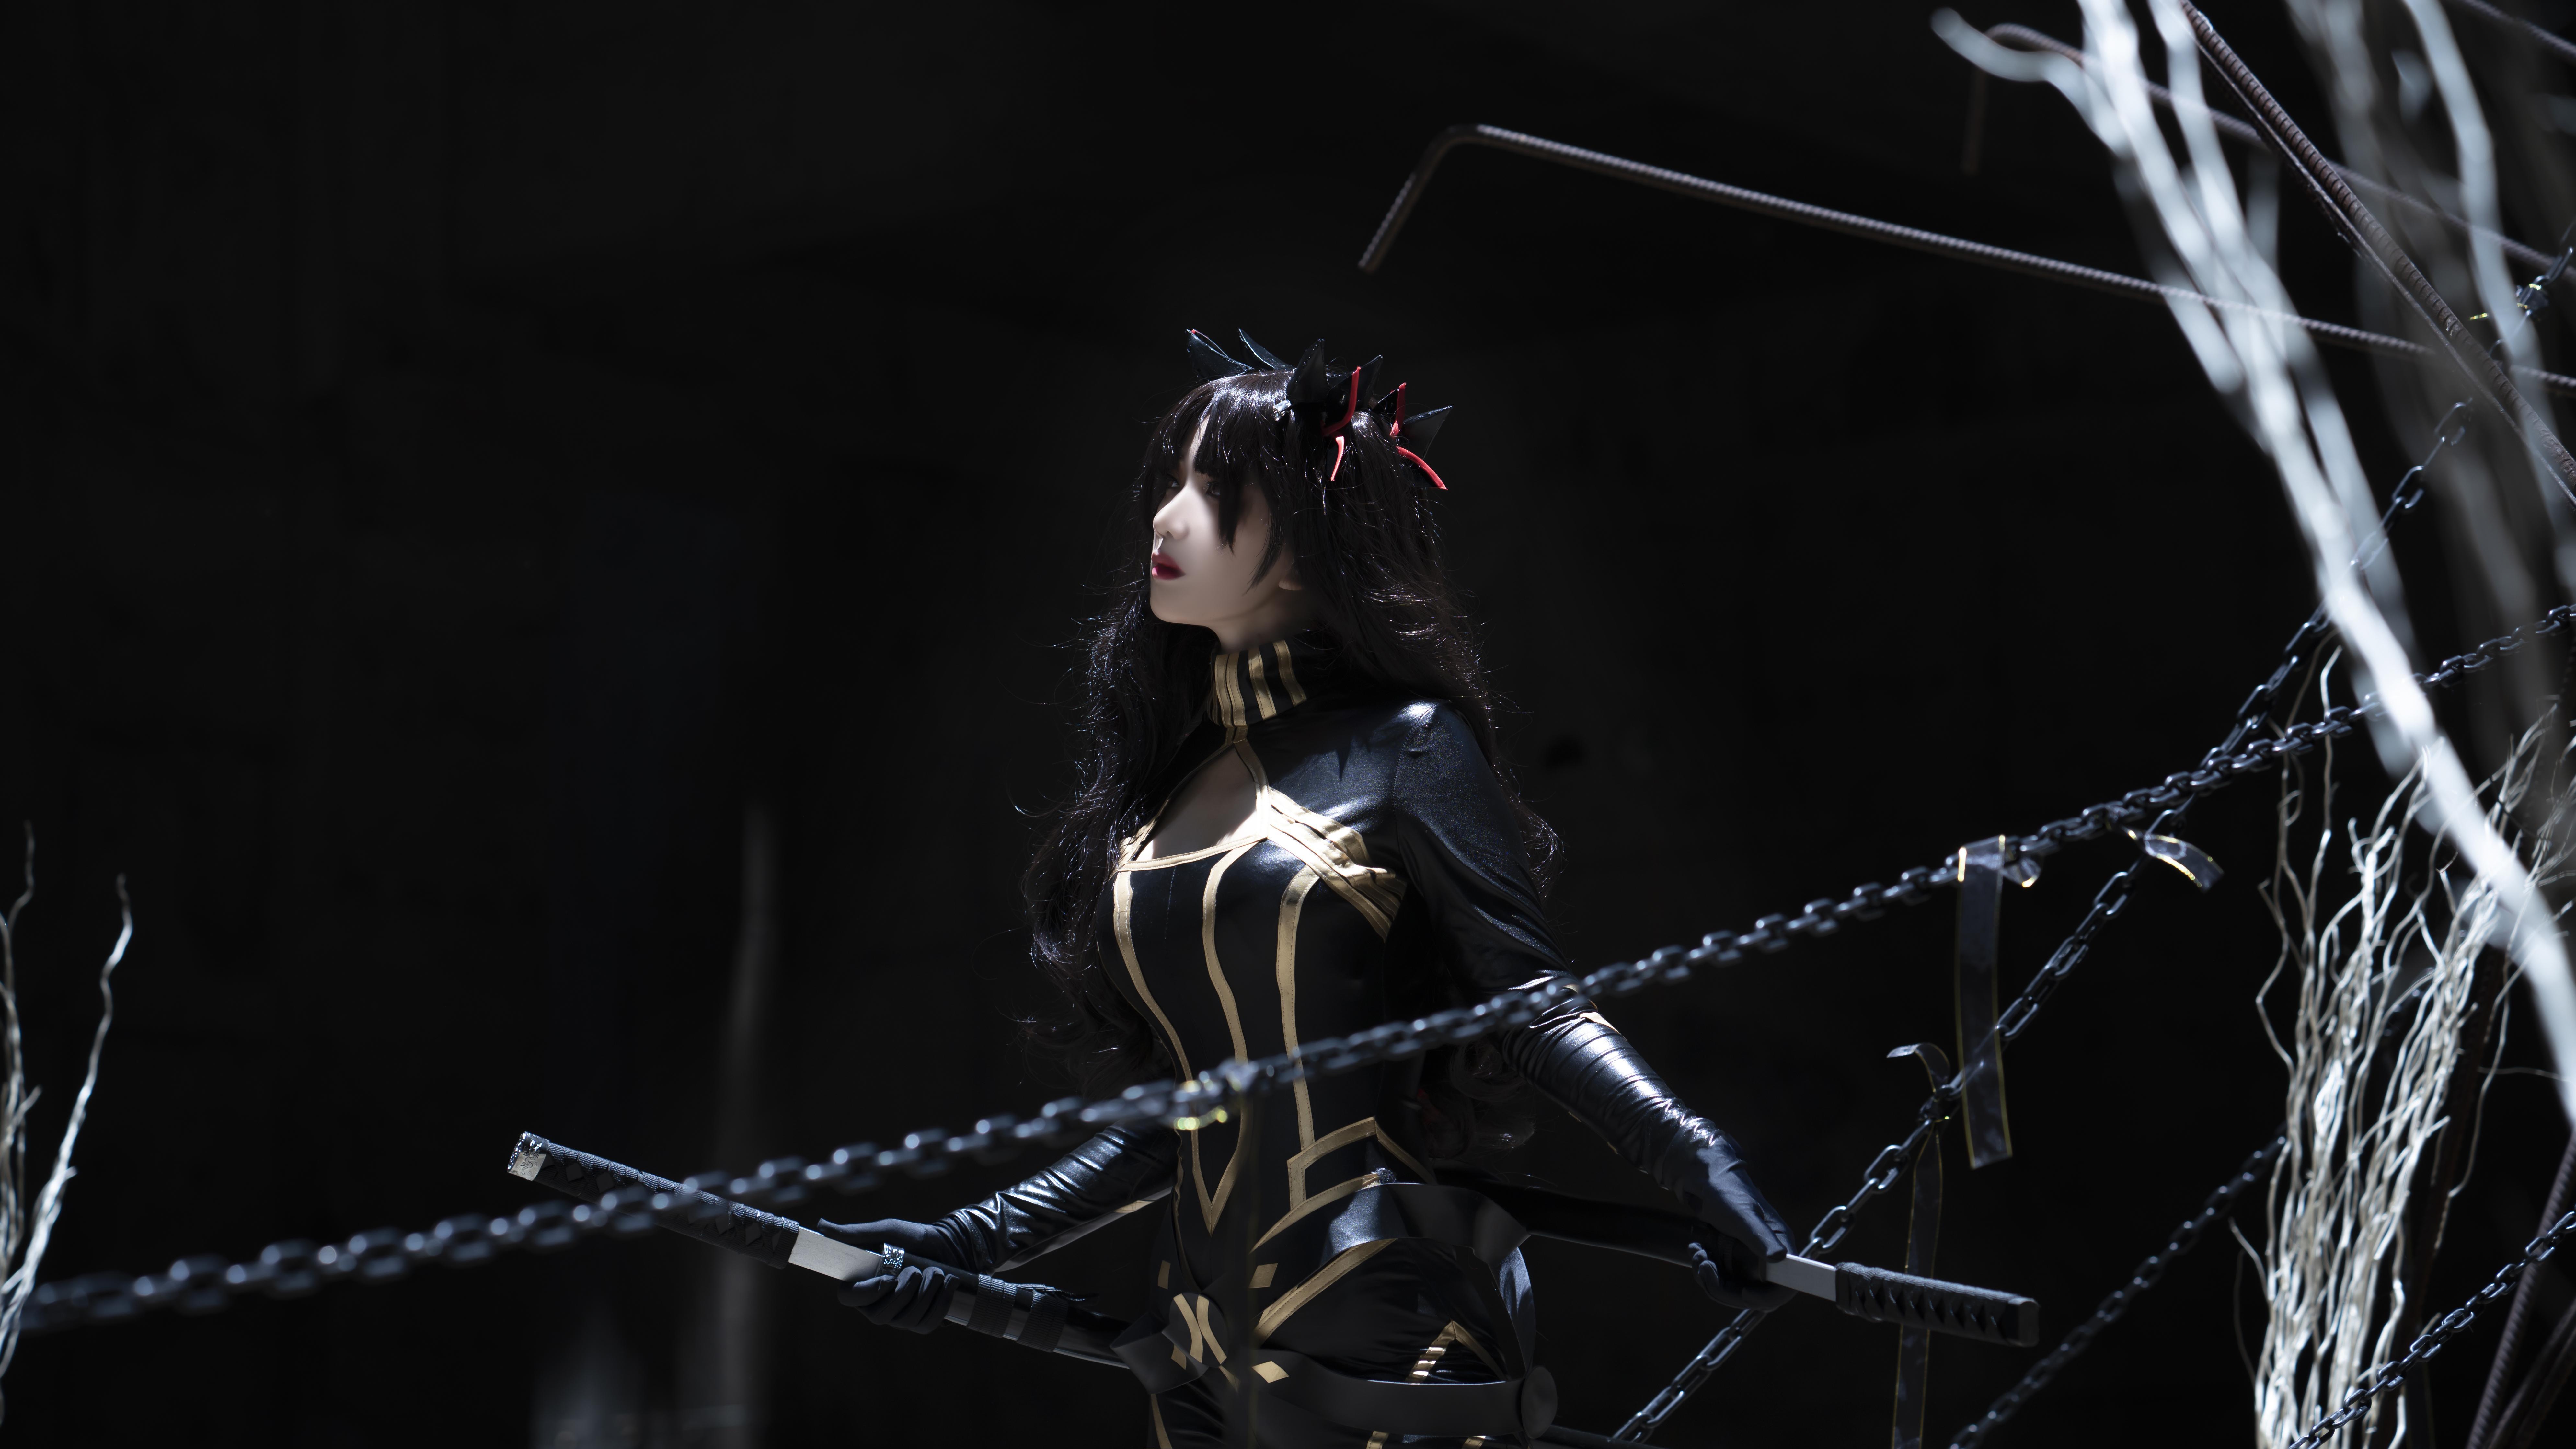 《FATE/GRAND ORDER》远坂凛cosplay【CN:七夜喵】-第3张